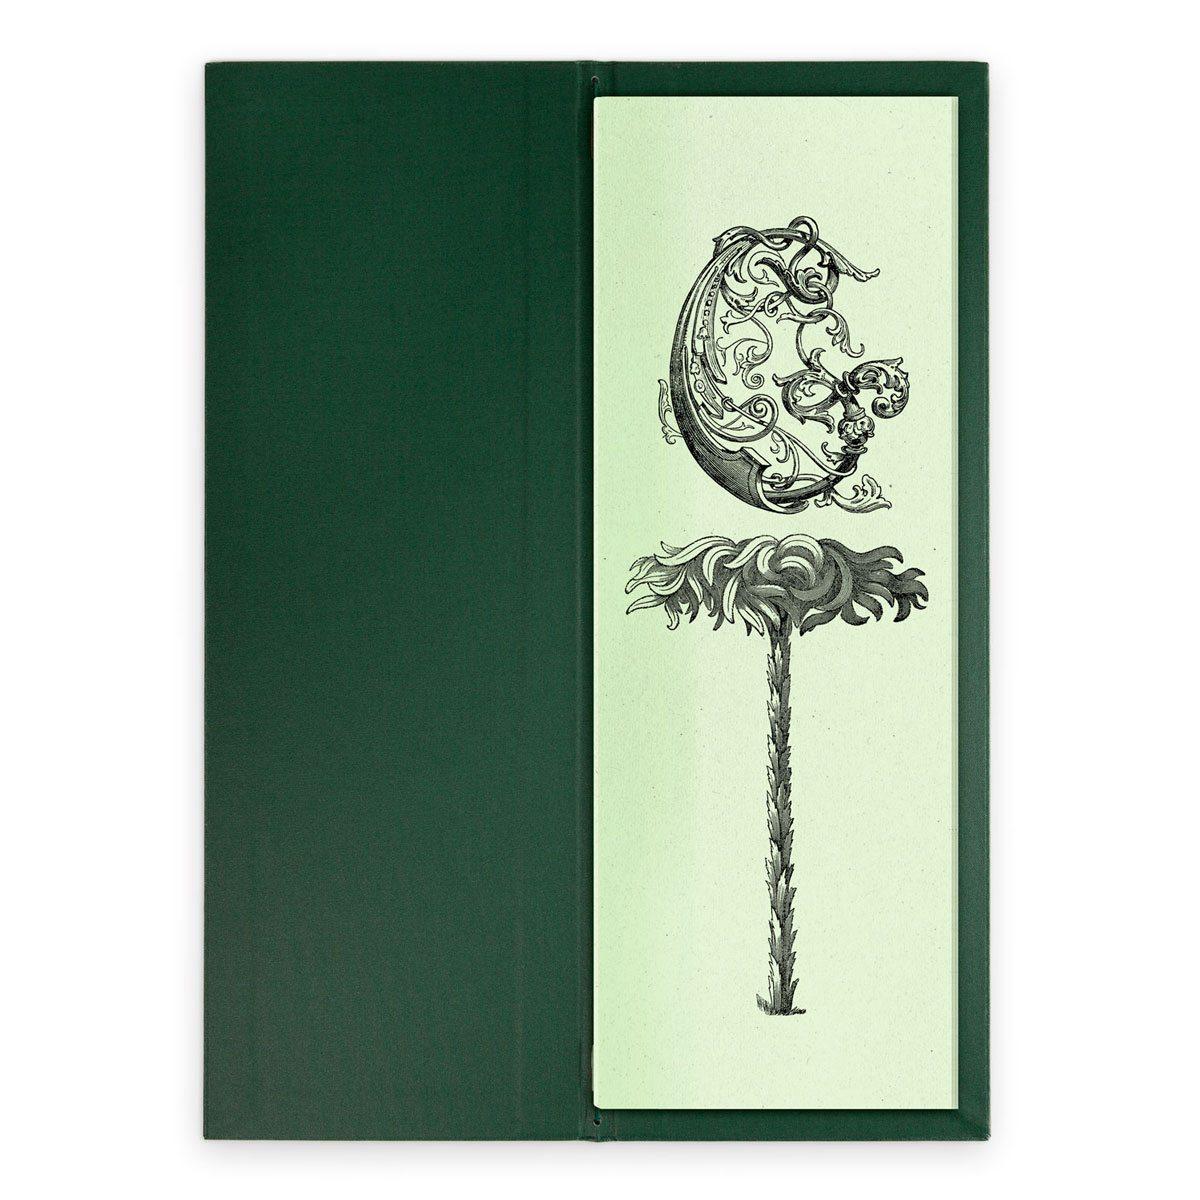 sketch london wine list glade green gravures anciennes engraving vintage punk bananas